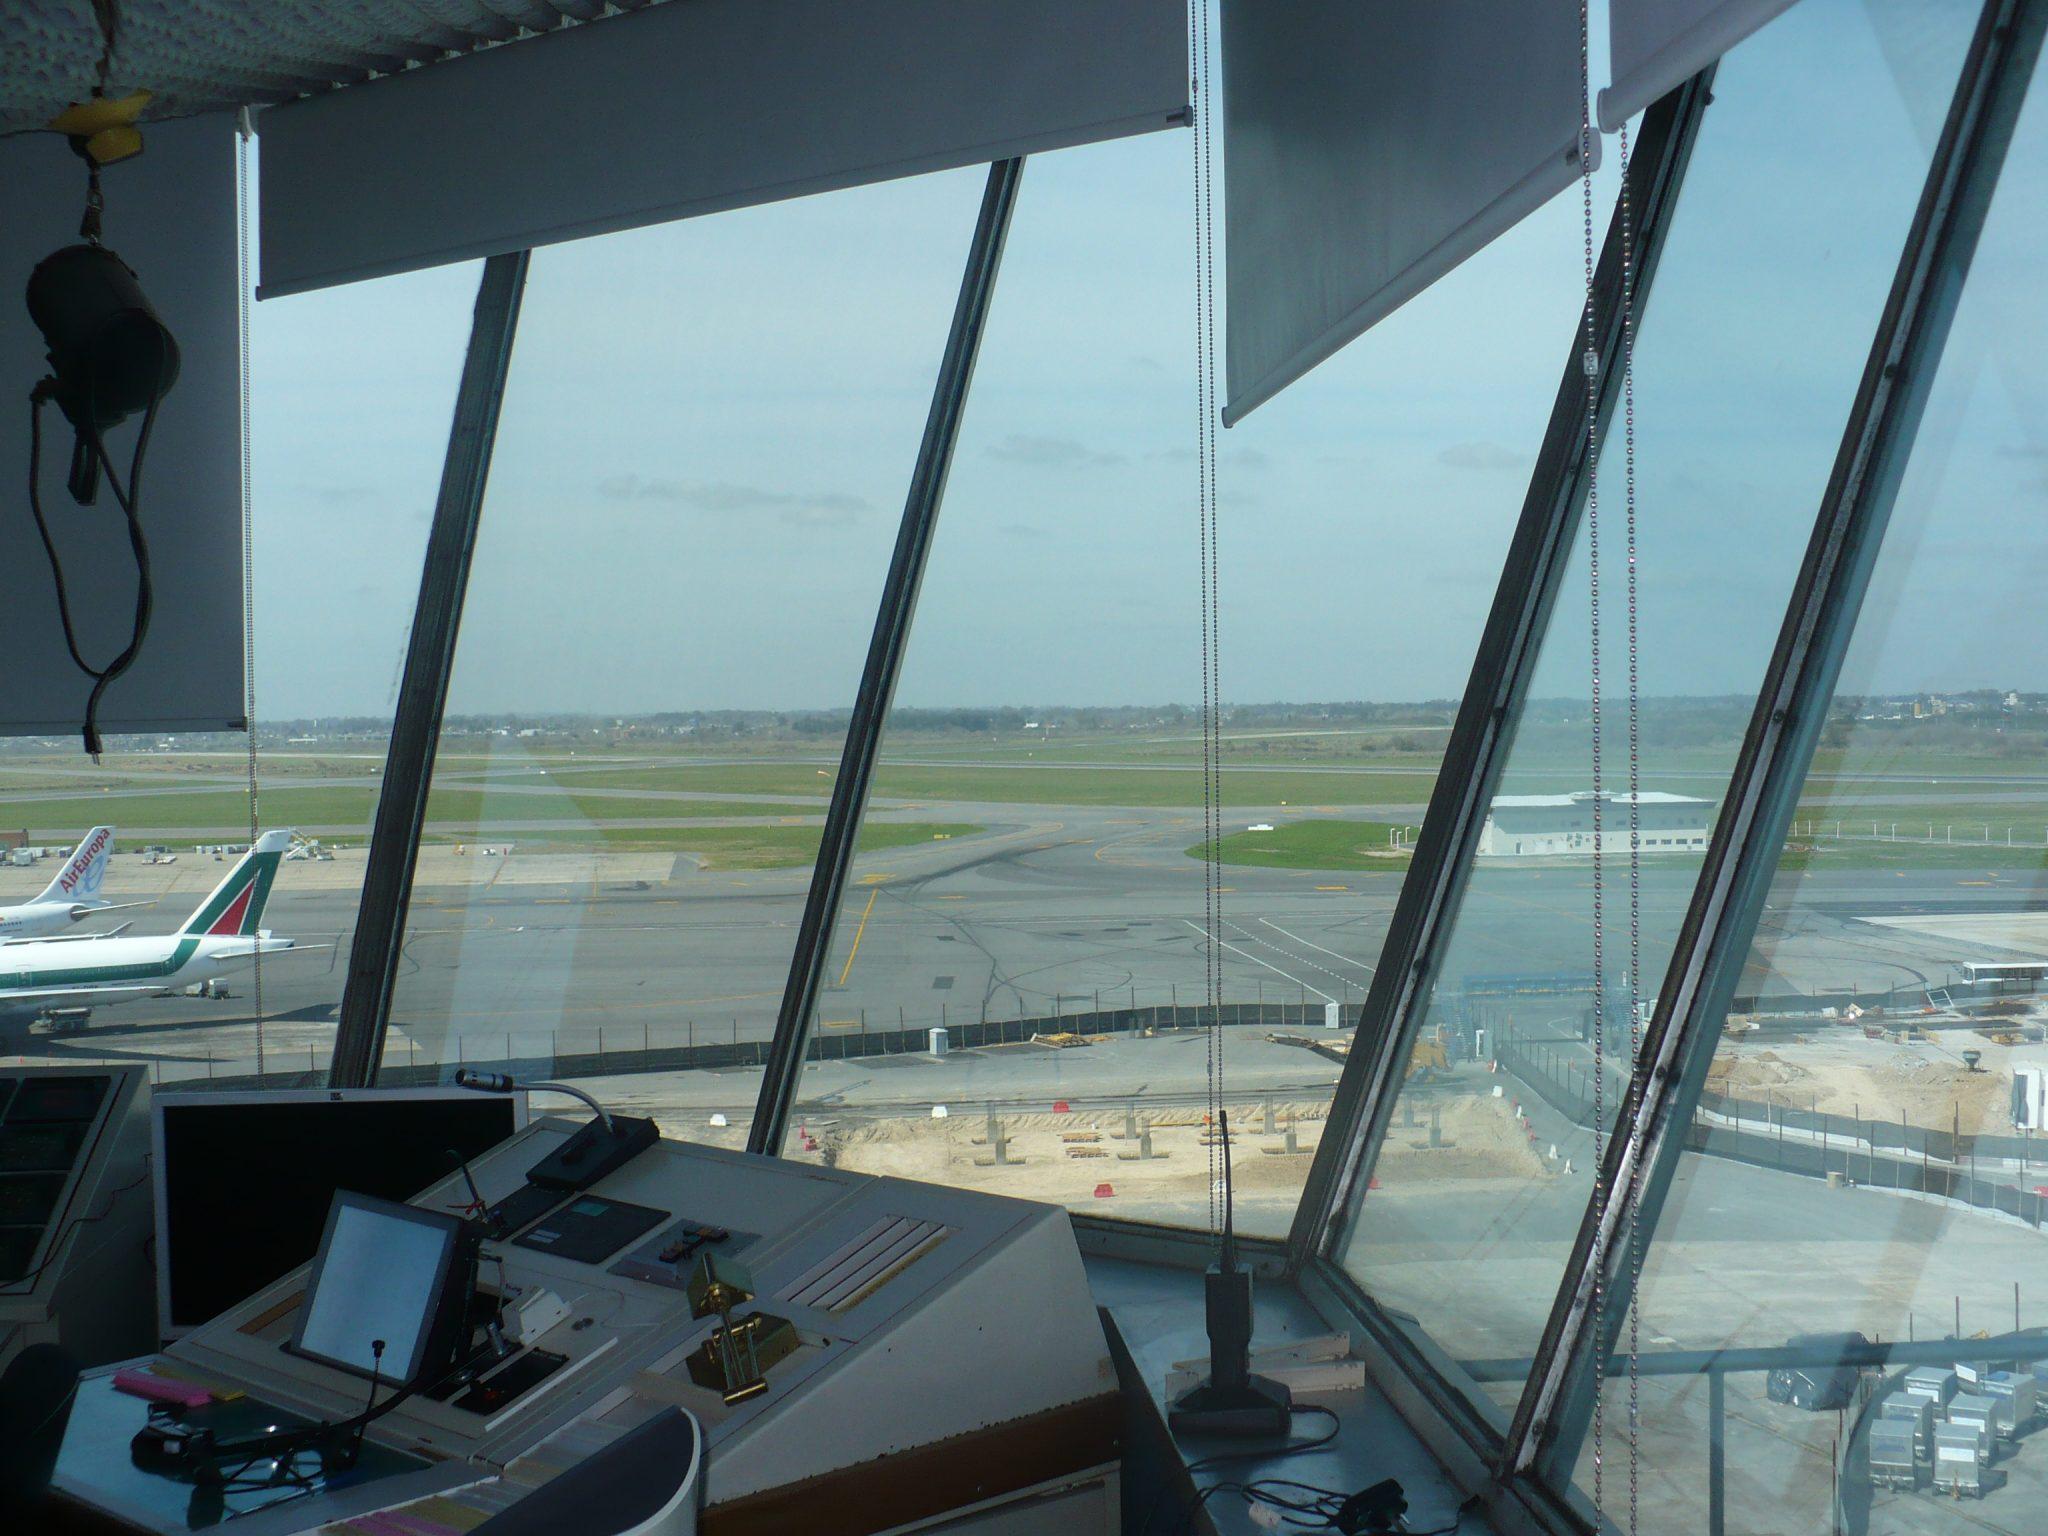 Piloto bloquea comunicaciones de una torre de control por cantar